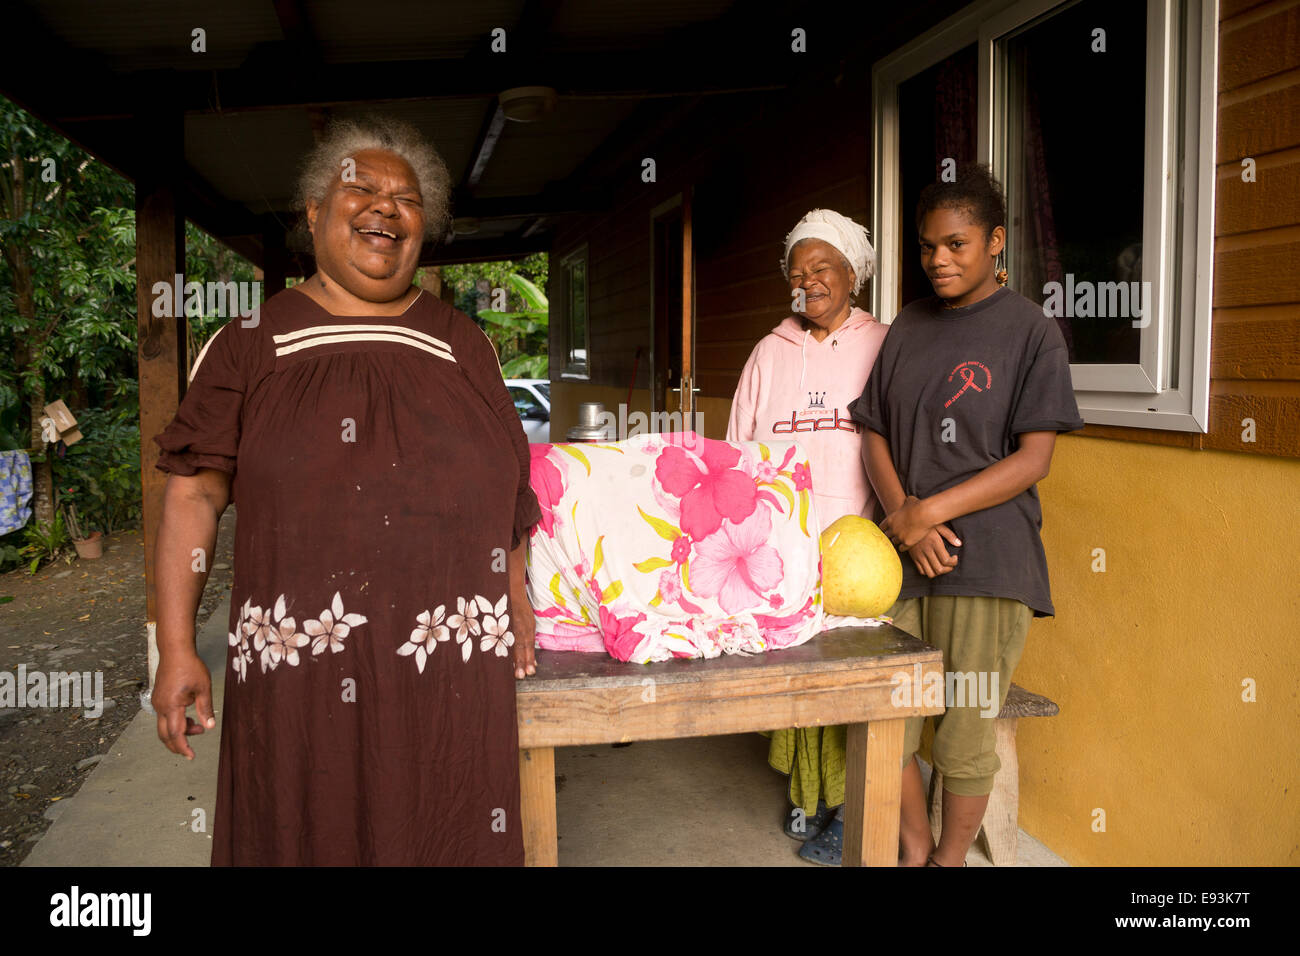 Elder local Kanak woman laughing, Hienghène, North Province, Grande Terre, New Caledonia, Oceania - Stock Image